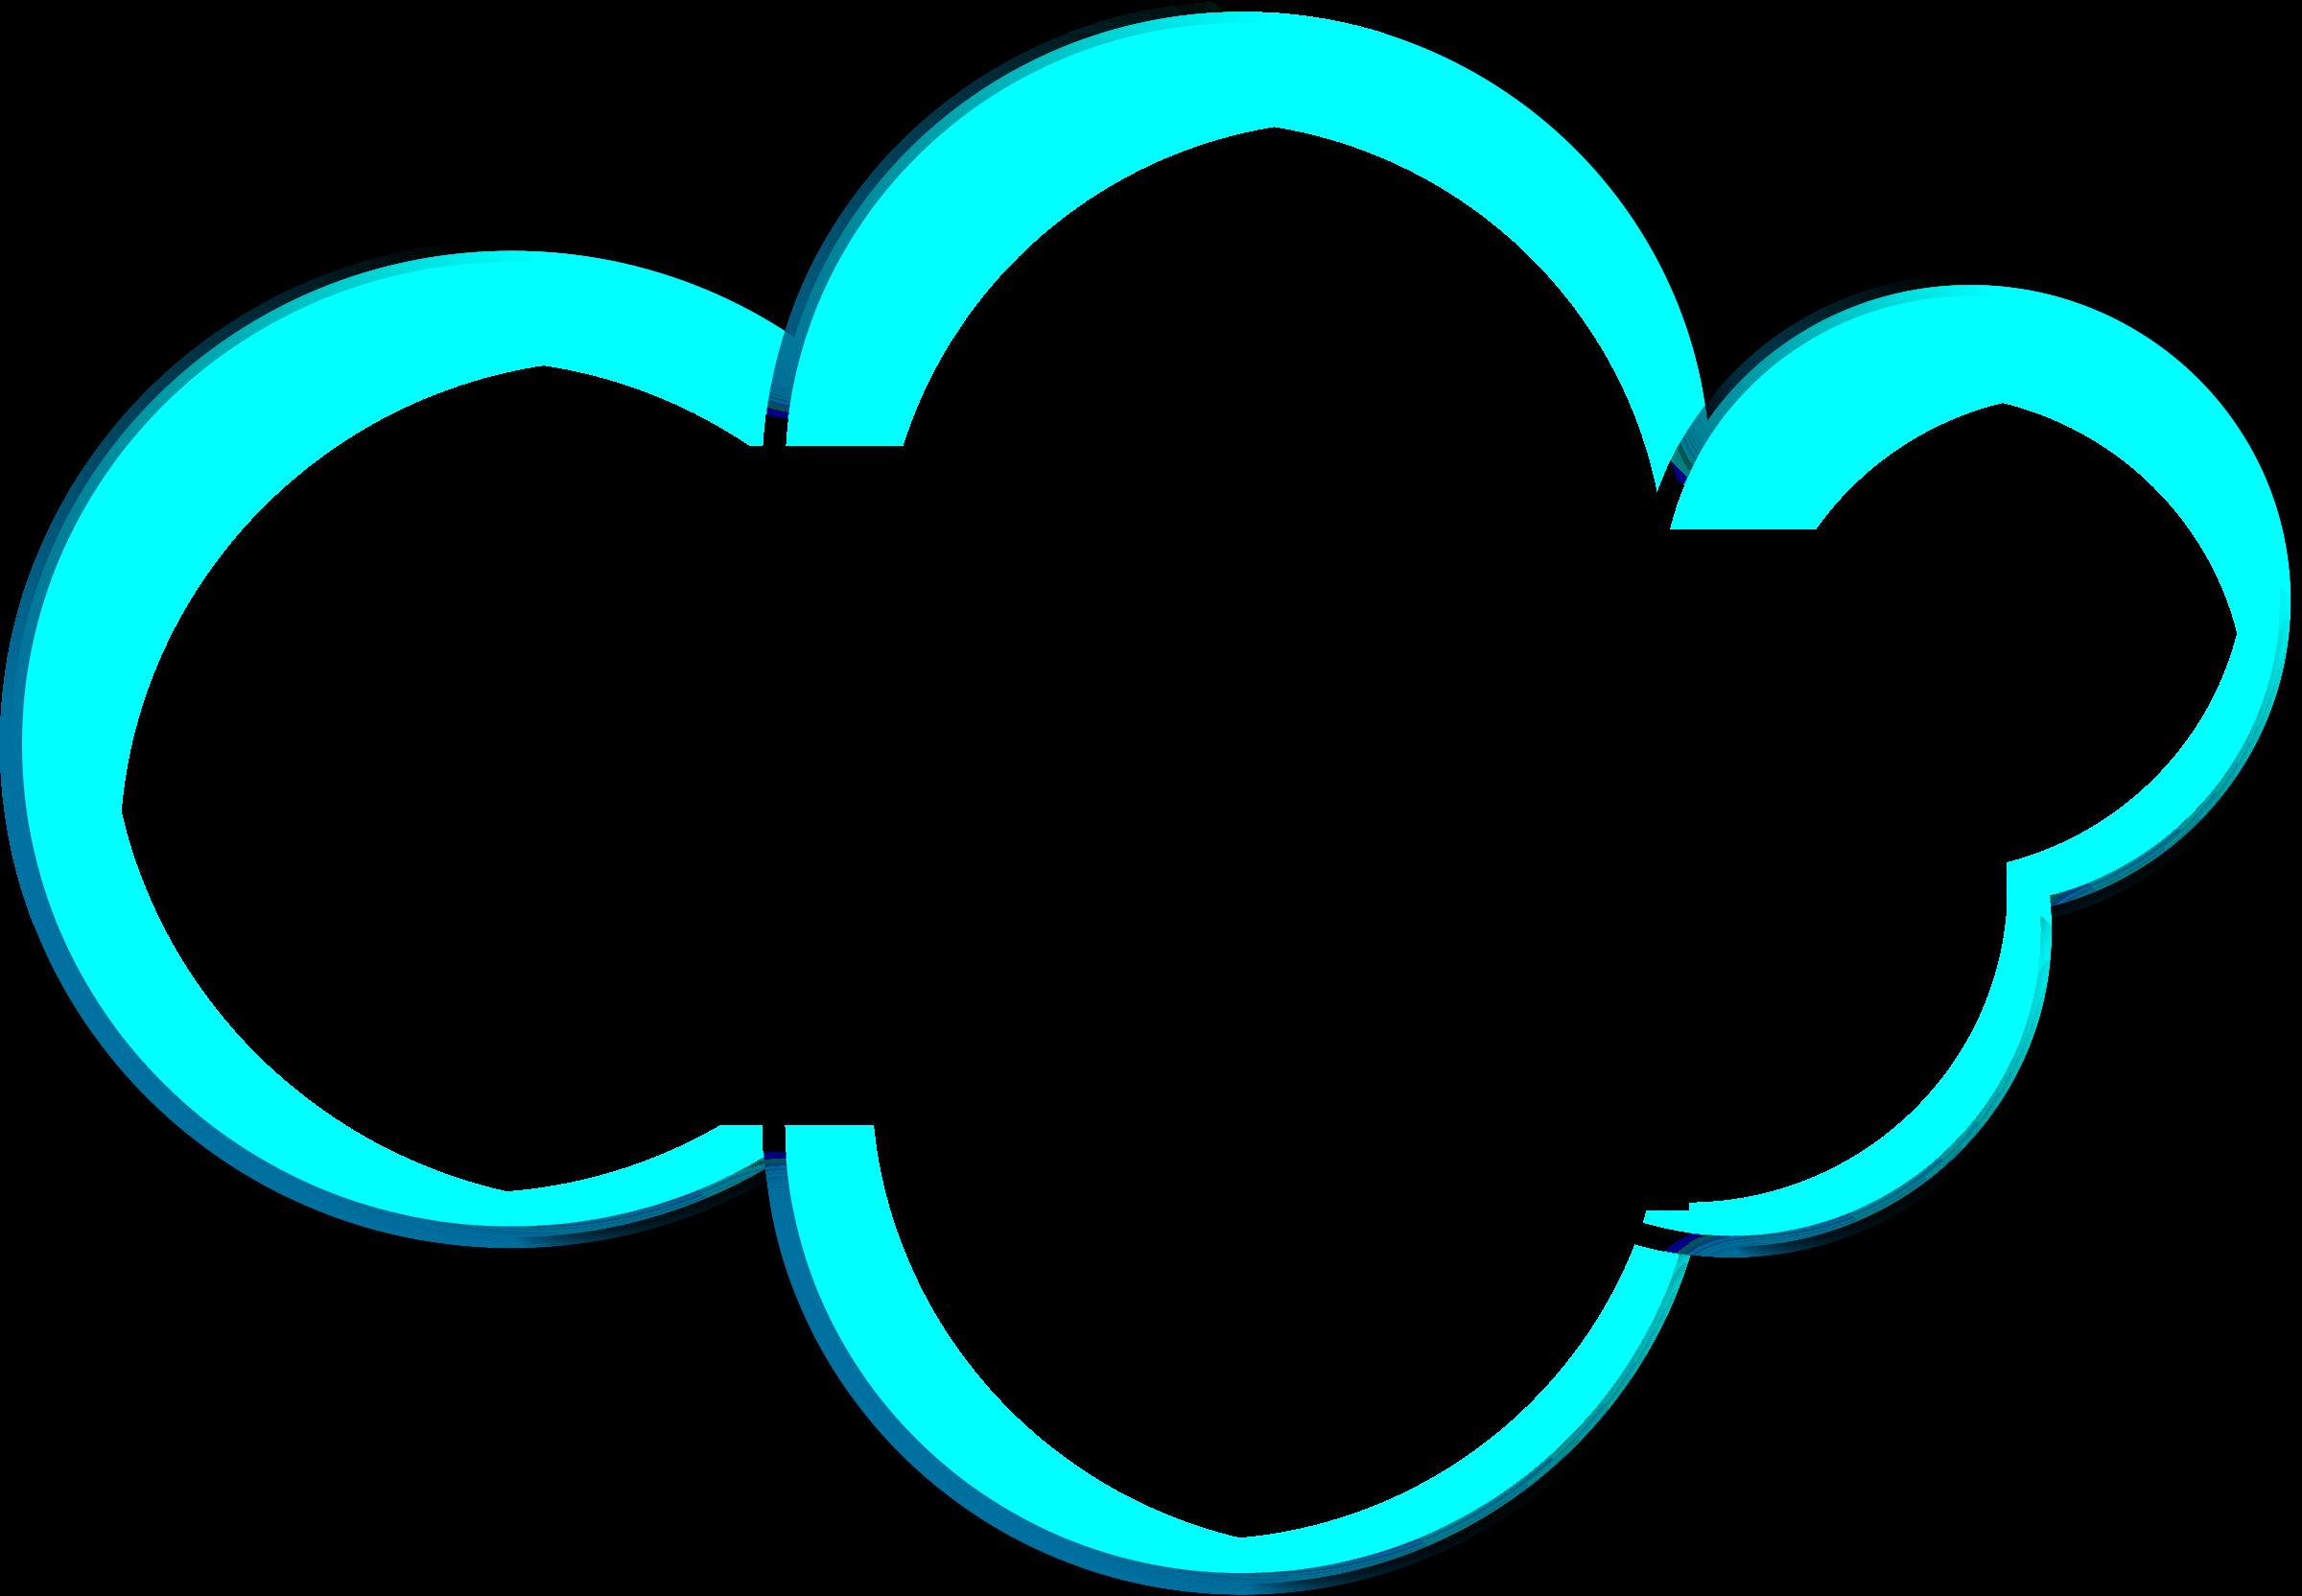 Clip art clouds transprent. Cloud clipart heart